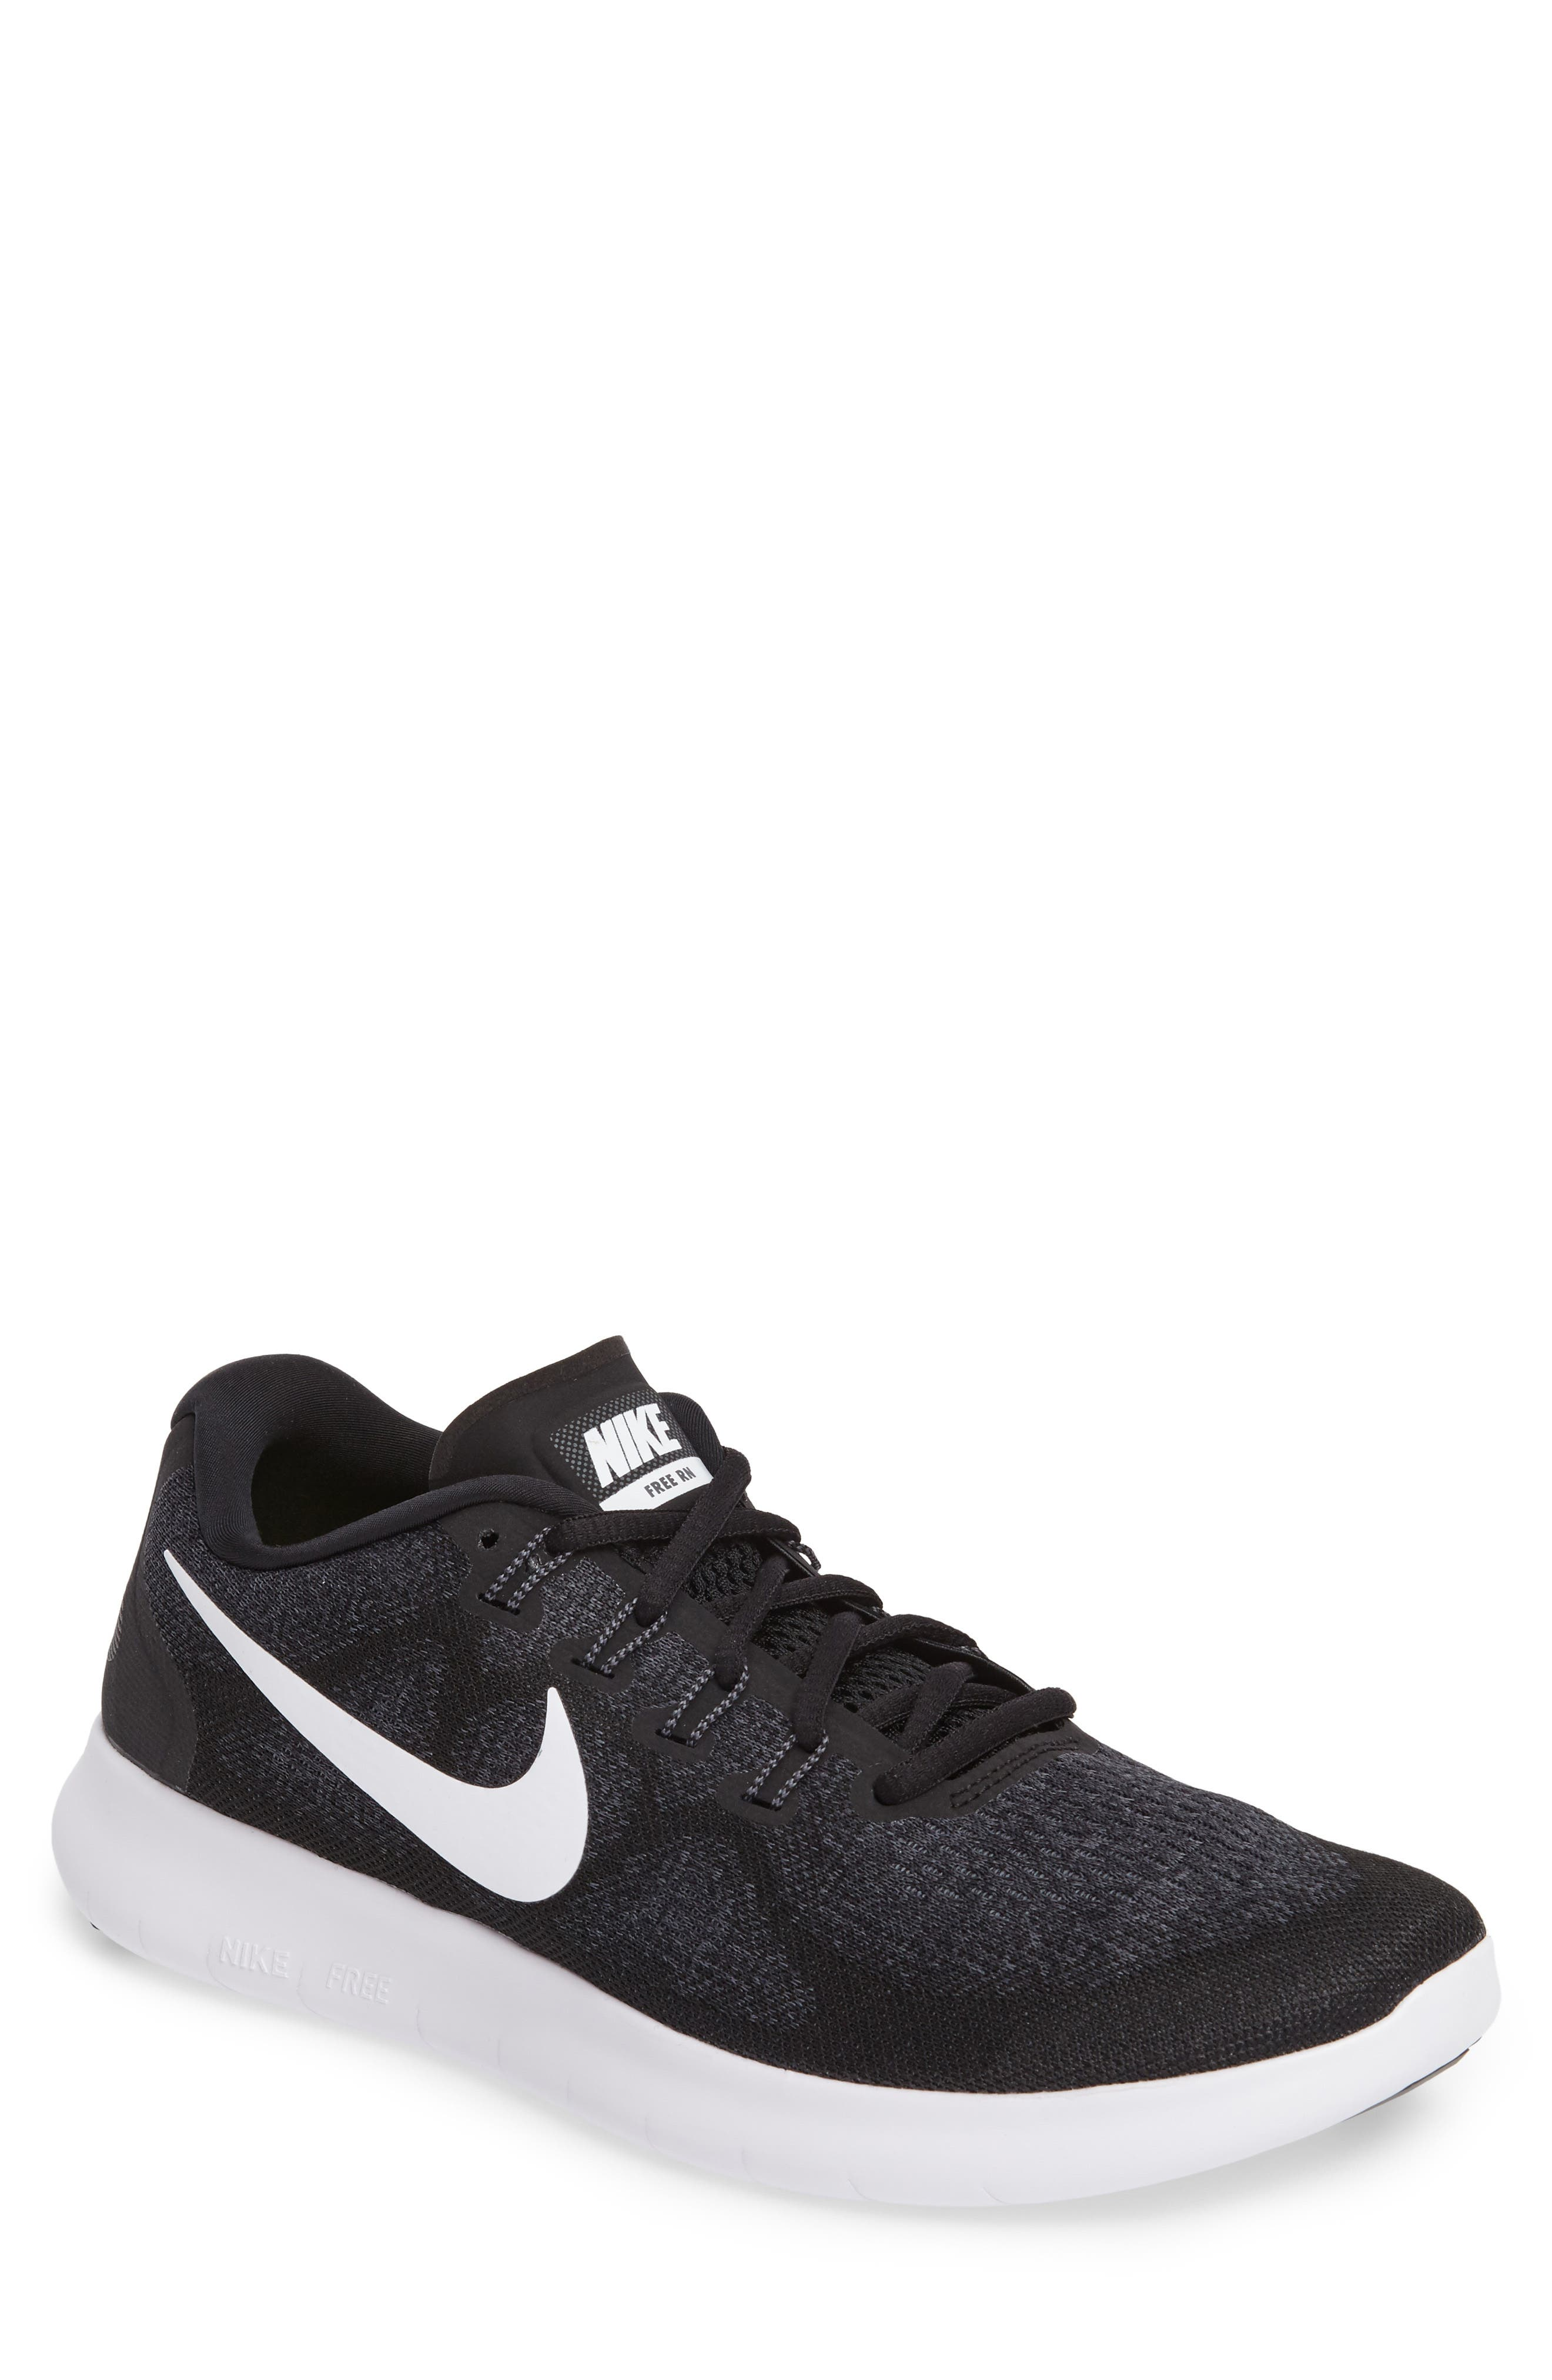 nike shoes white and black high top. nike free run 2017 running shoe (men) shoes white and black high top 0